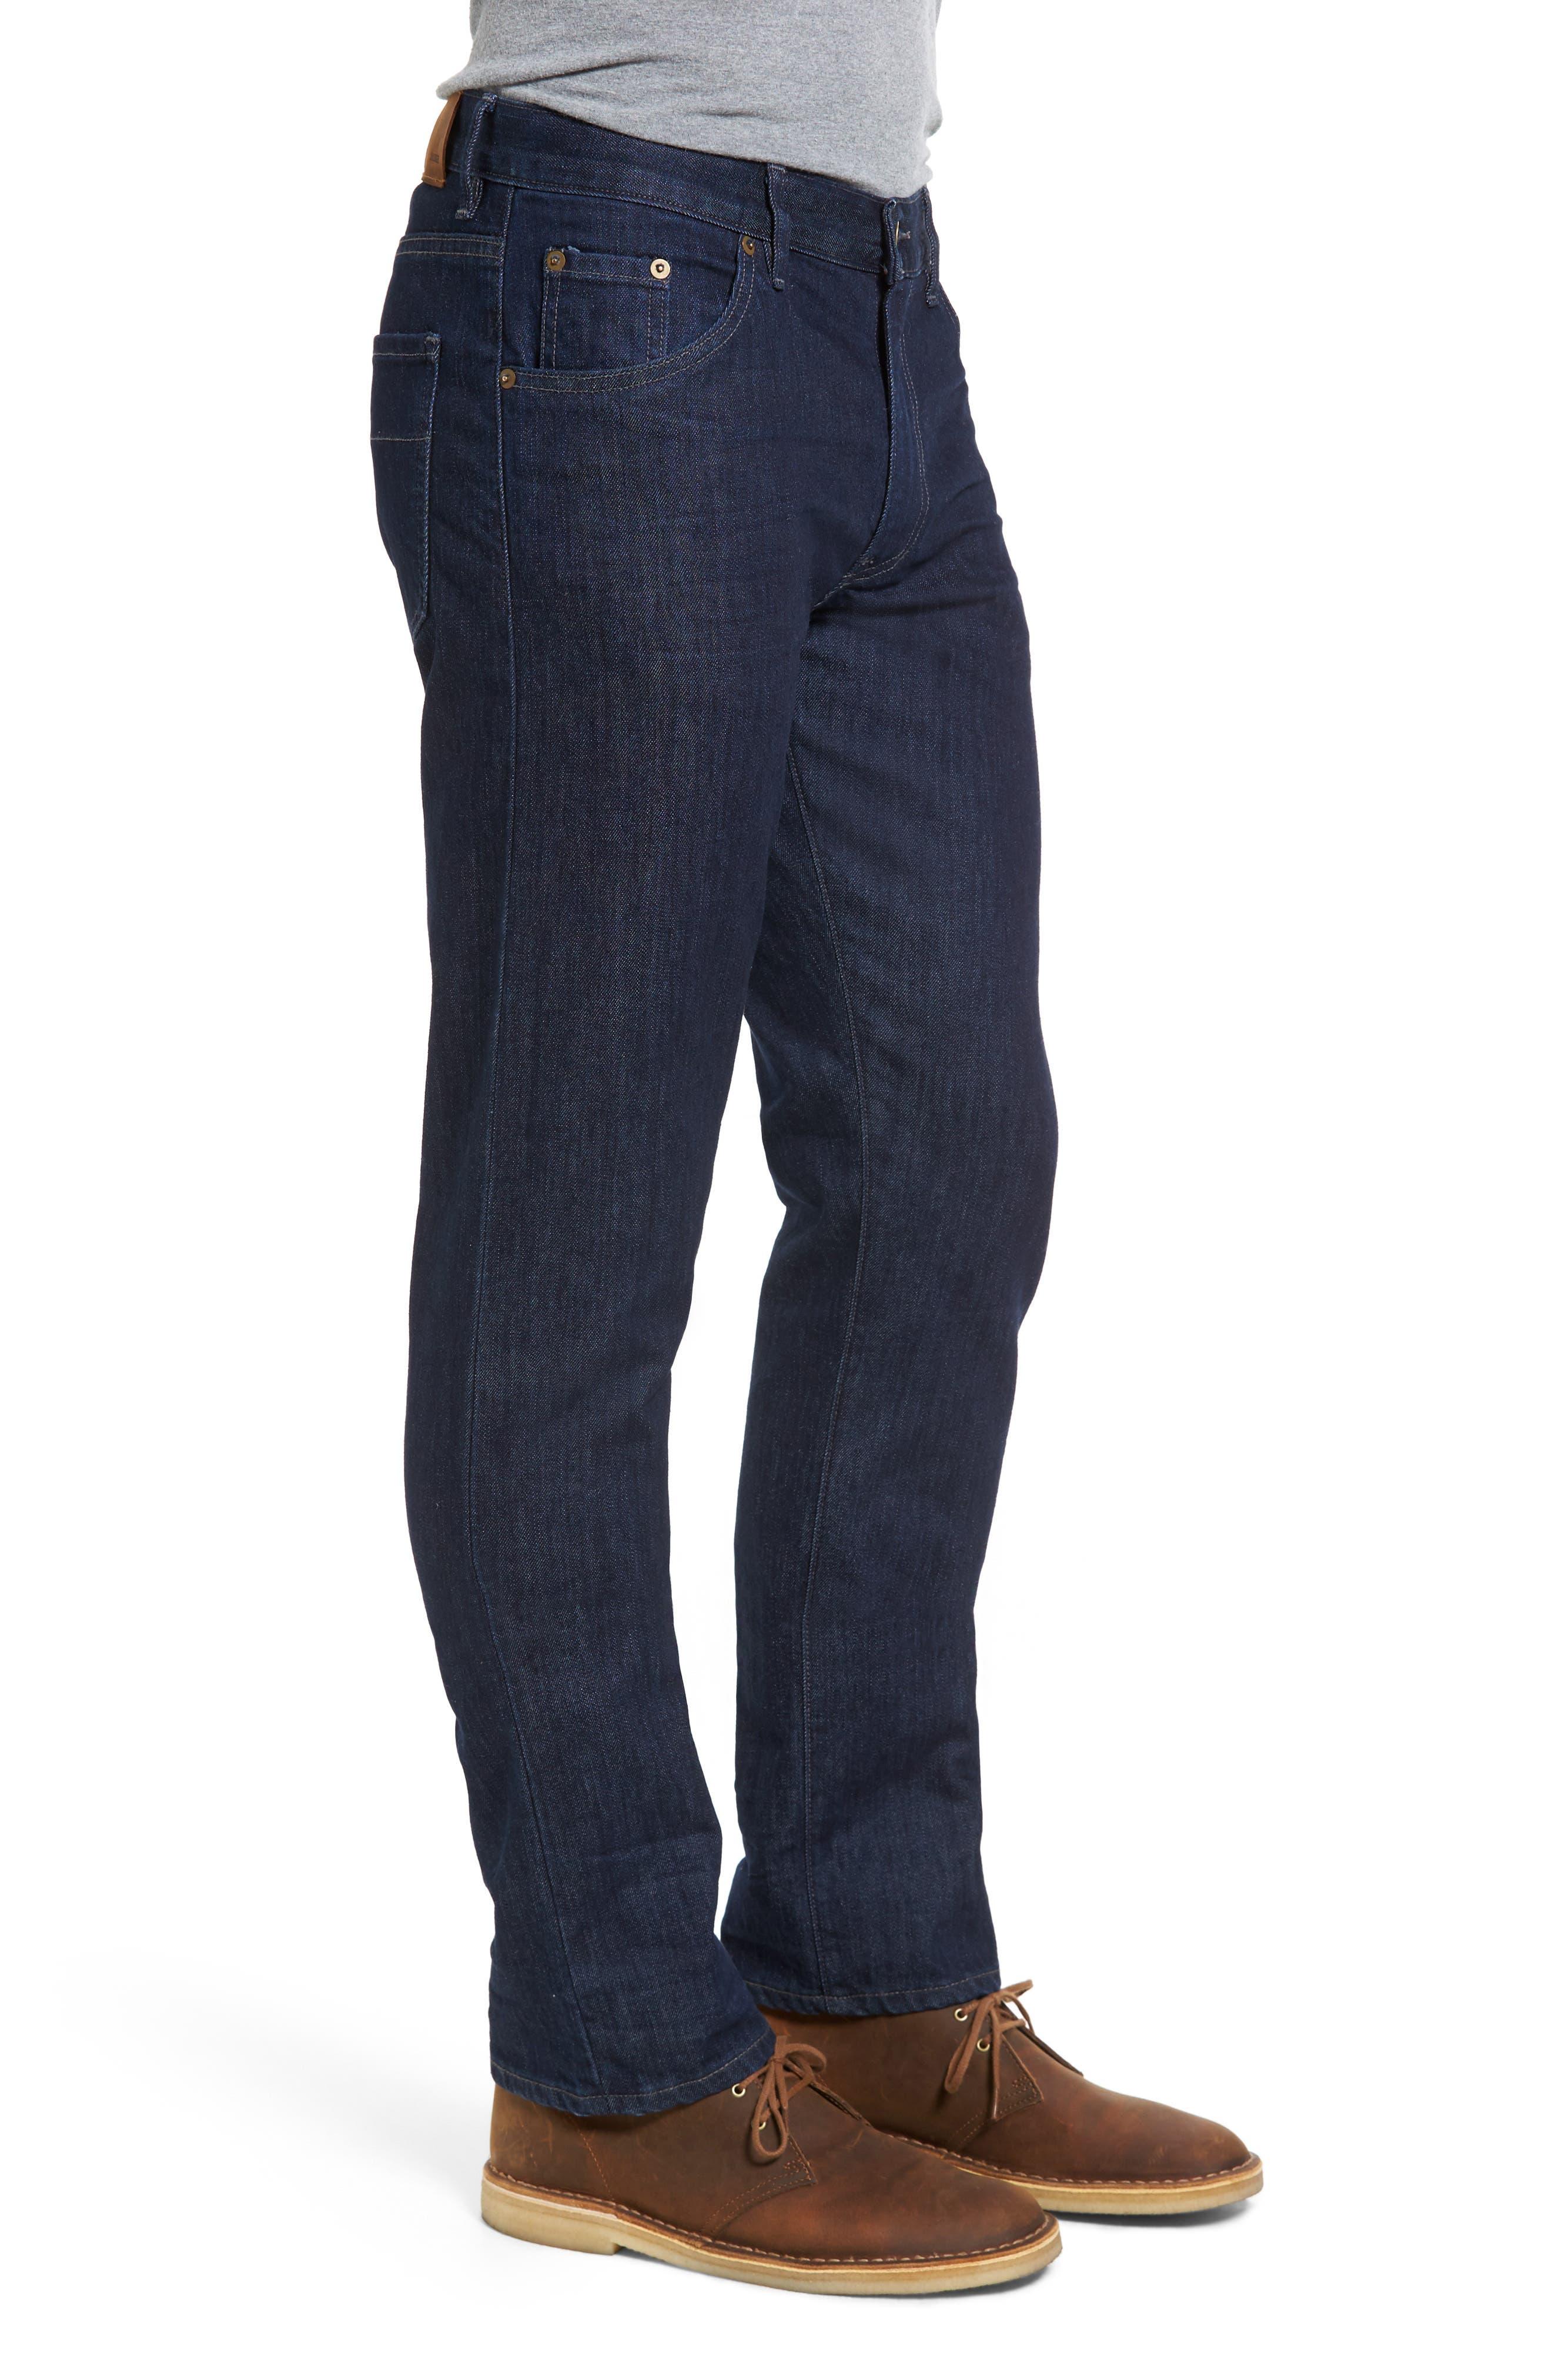 Jones Slim Fit Jeans,                             Alternate thumbnail 3, color,                             418